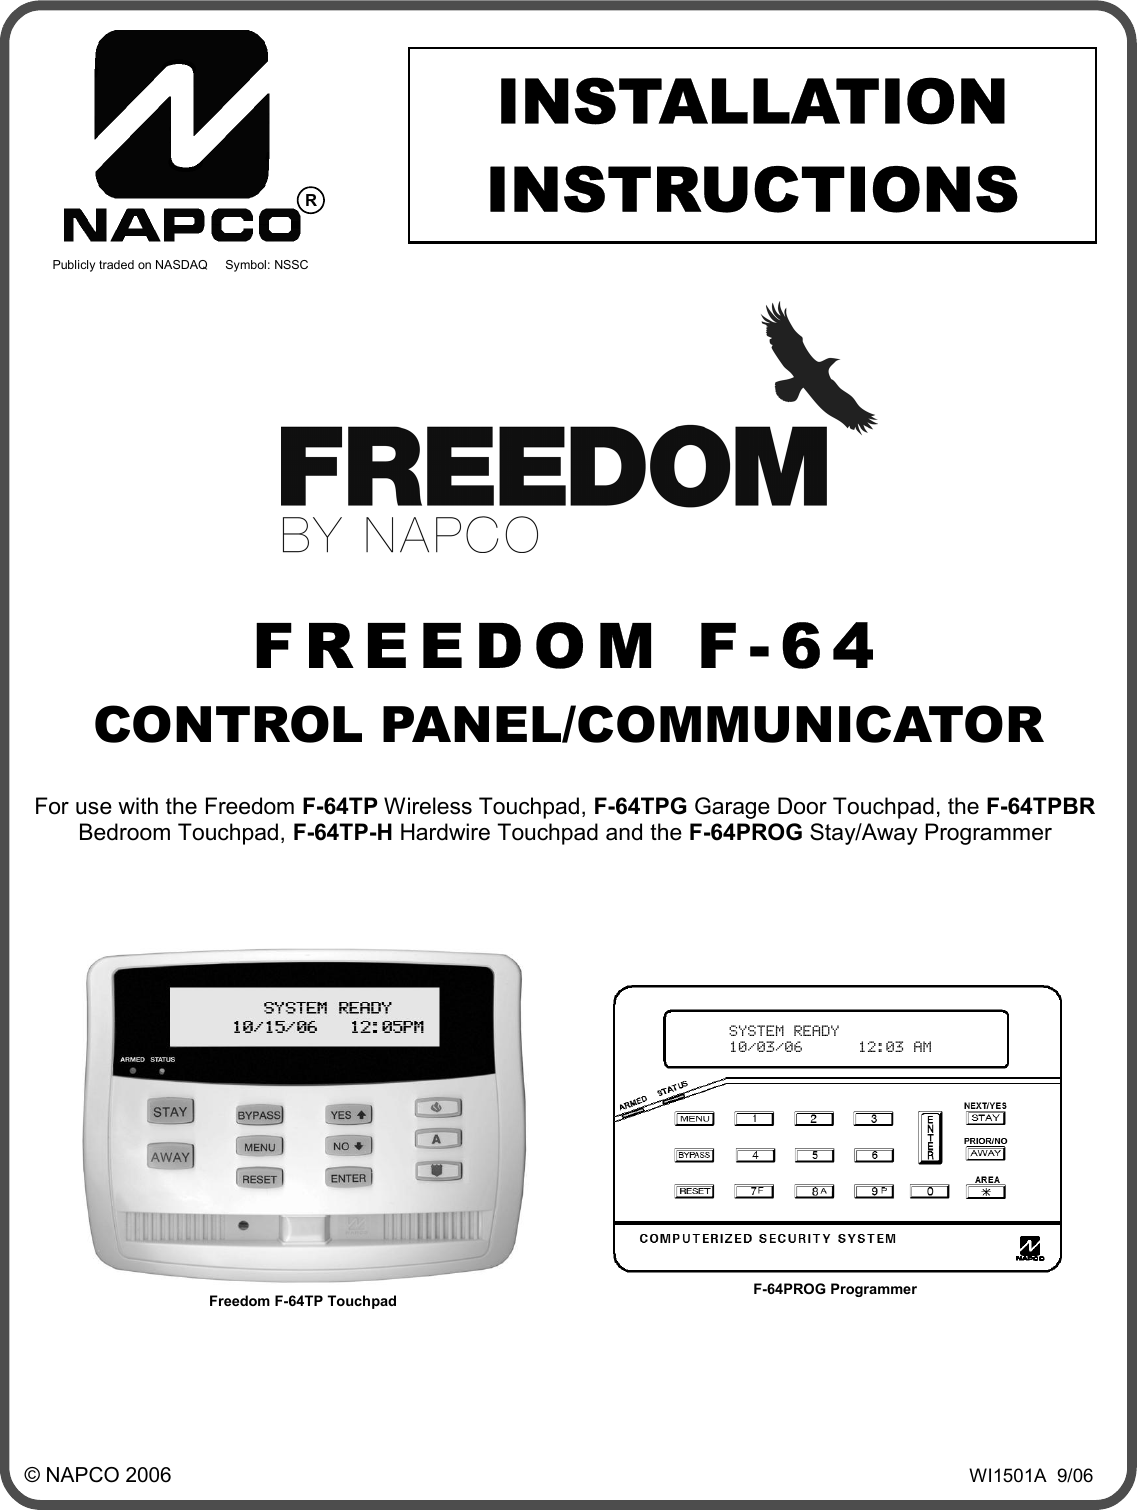 Napco security technologies wi1501a users manual afreedom for Gemini garage door motor manual